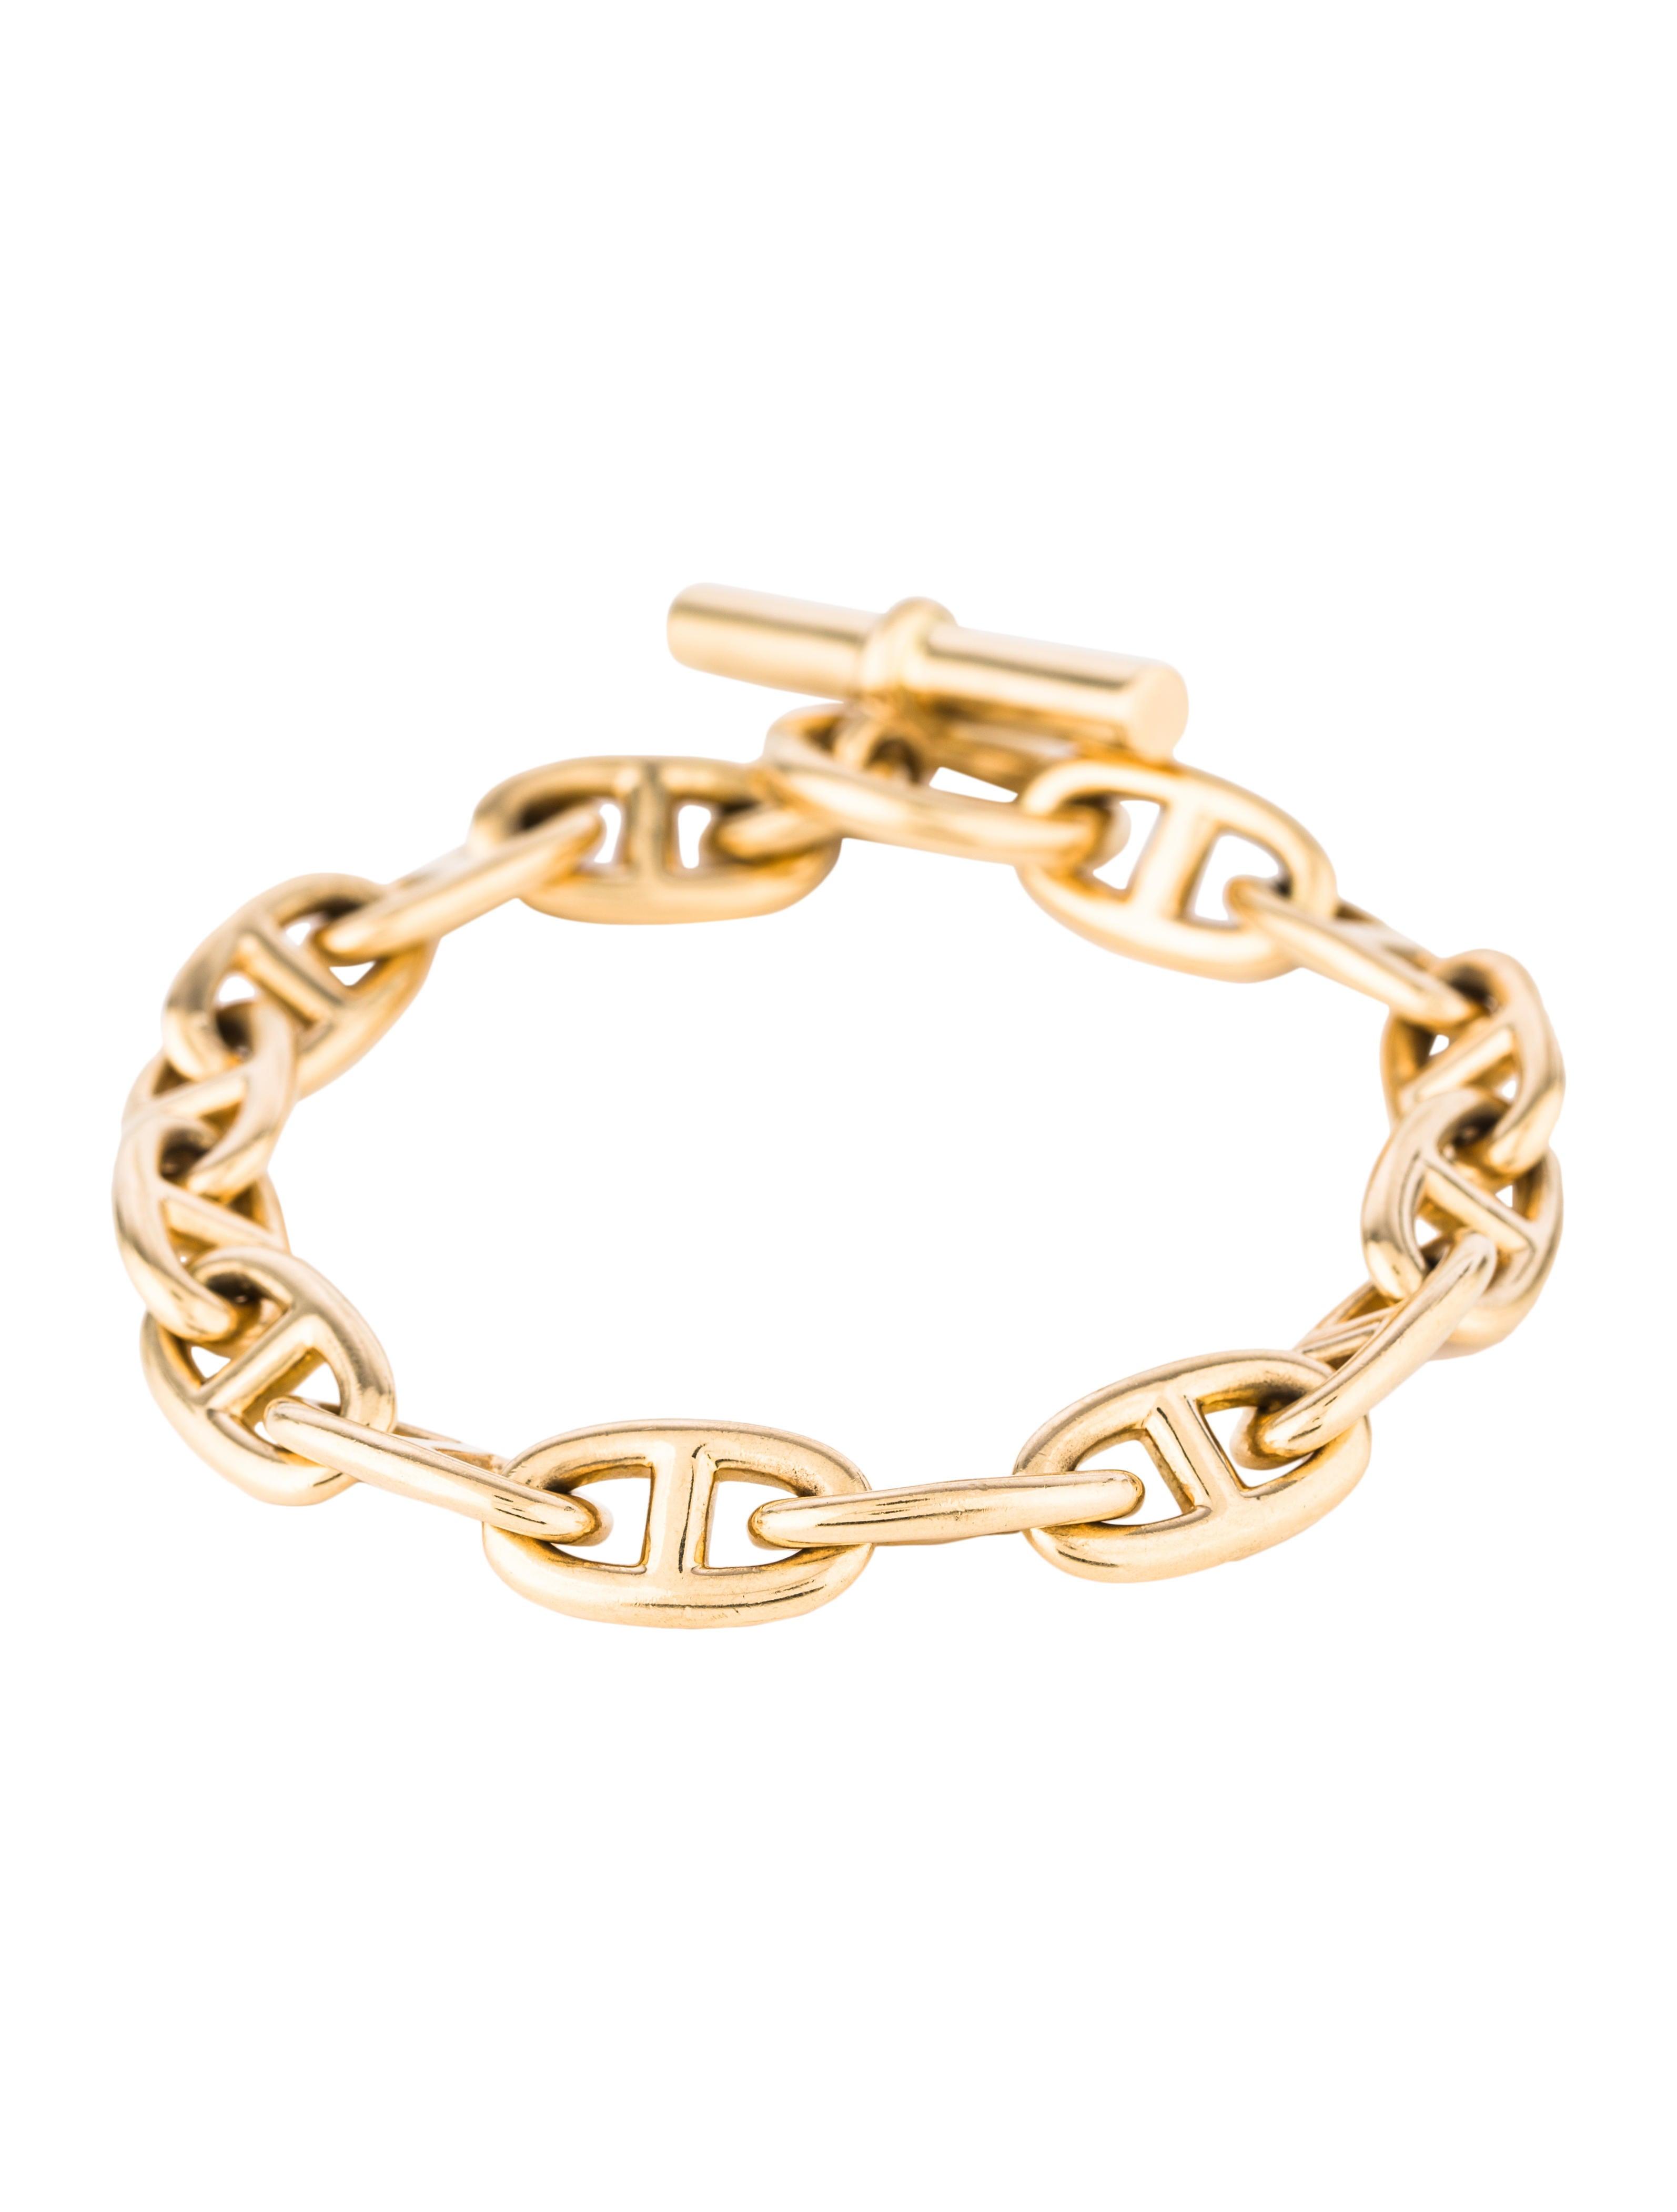 da469a6d9f67a7 Hermès Chaîne d'Ancre Bracelet - Bracelets - HER172193 | The RealReal